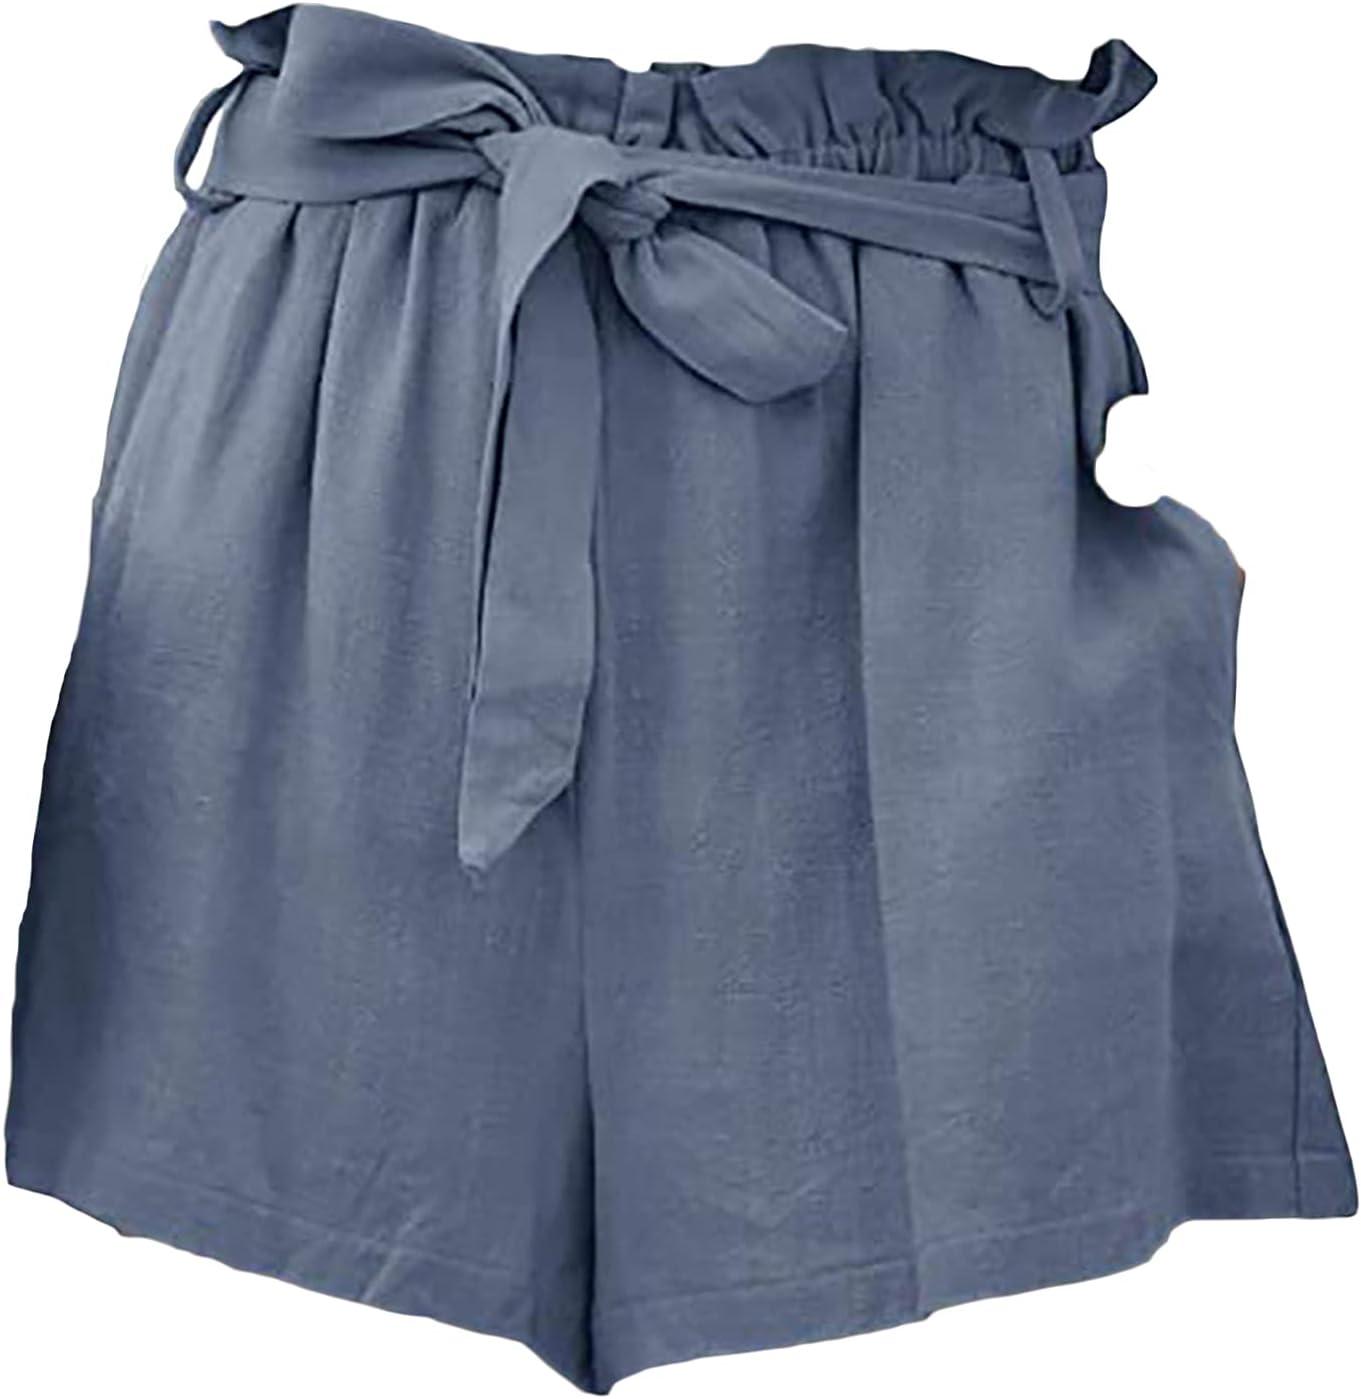 Women's Bow Tie Ruffle Shorts High Paper Waist Bag Max 56% OFF Bowknot Loose Japan Maker New